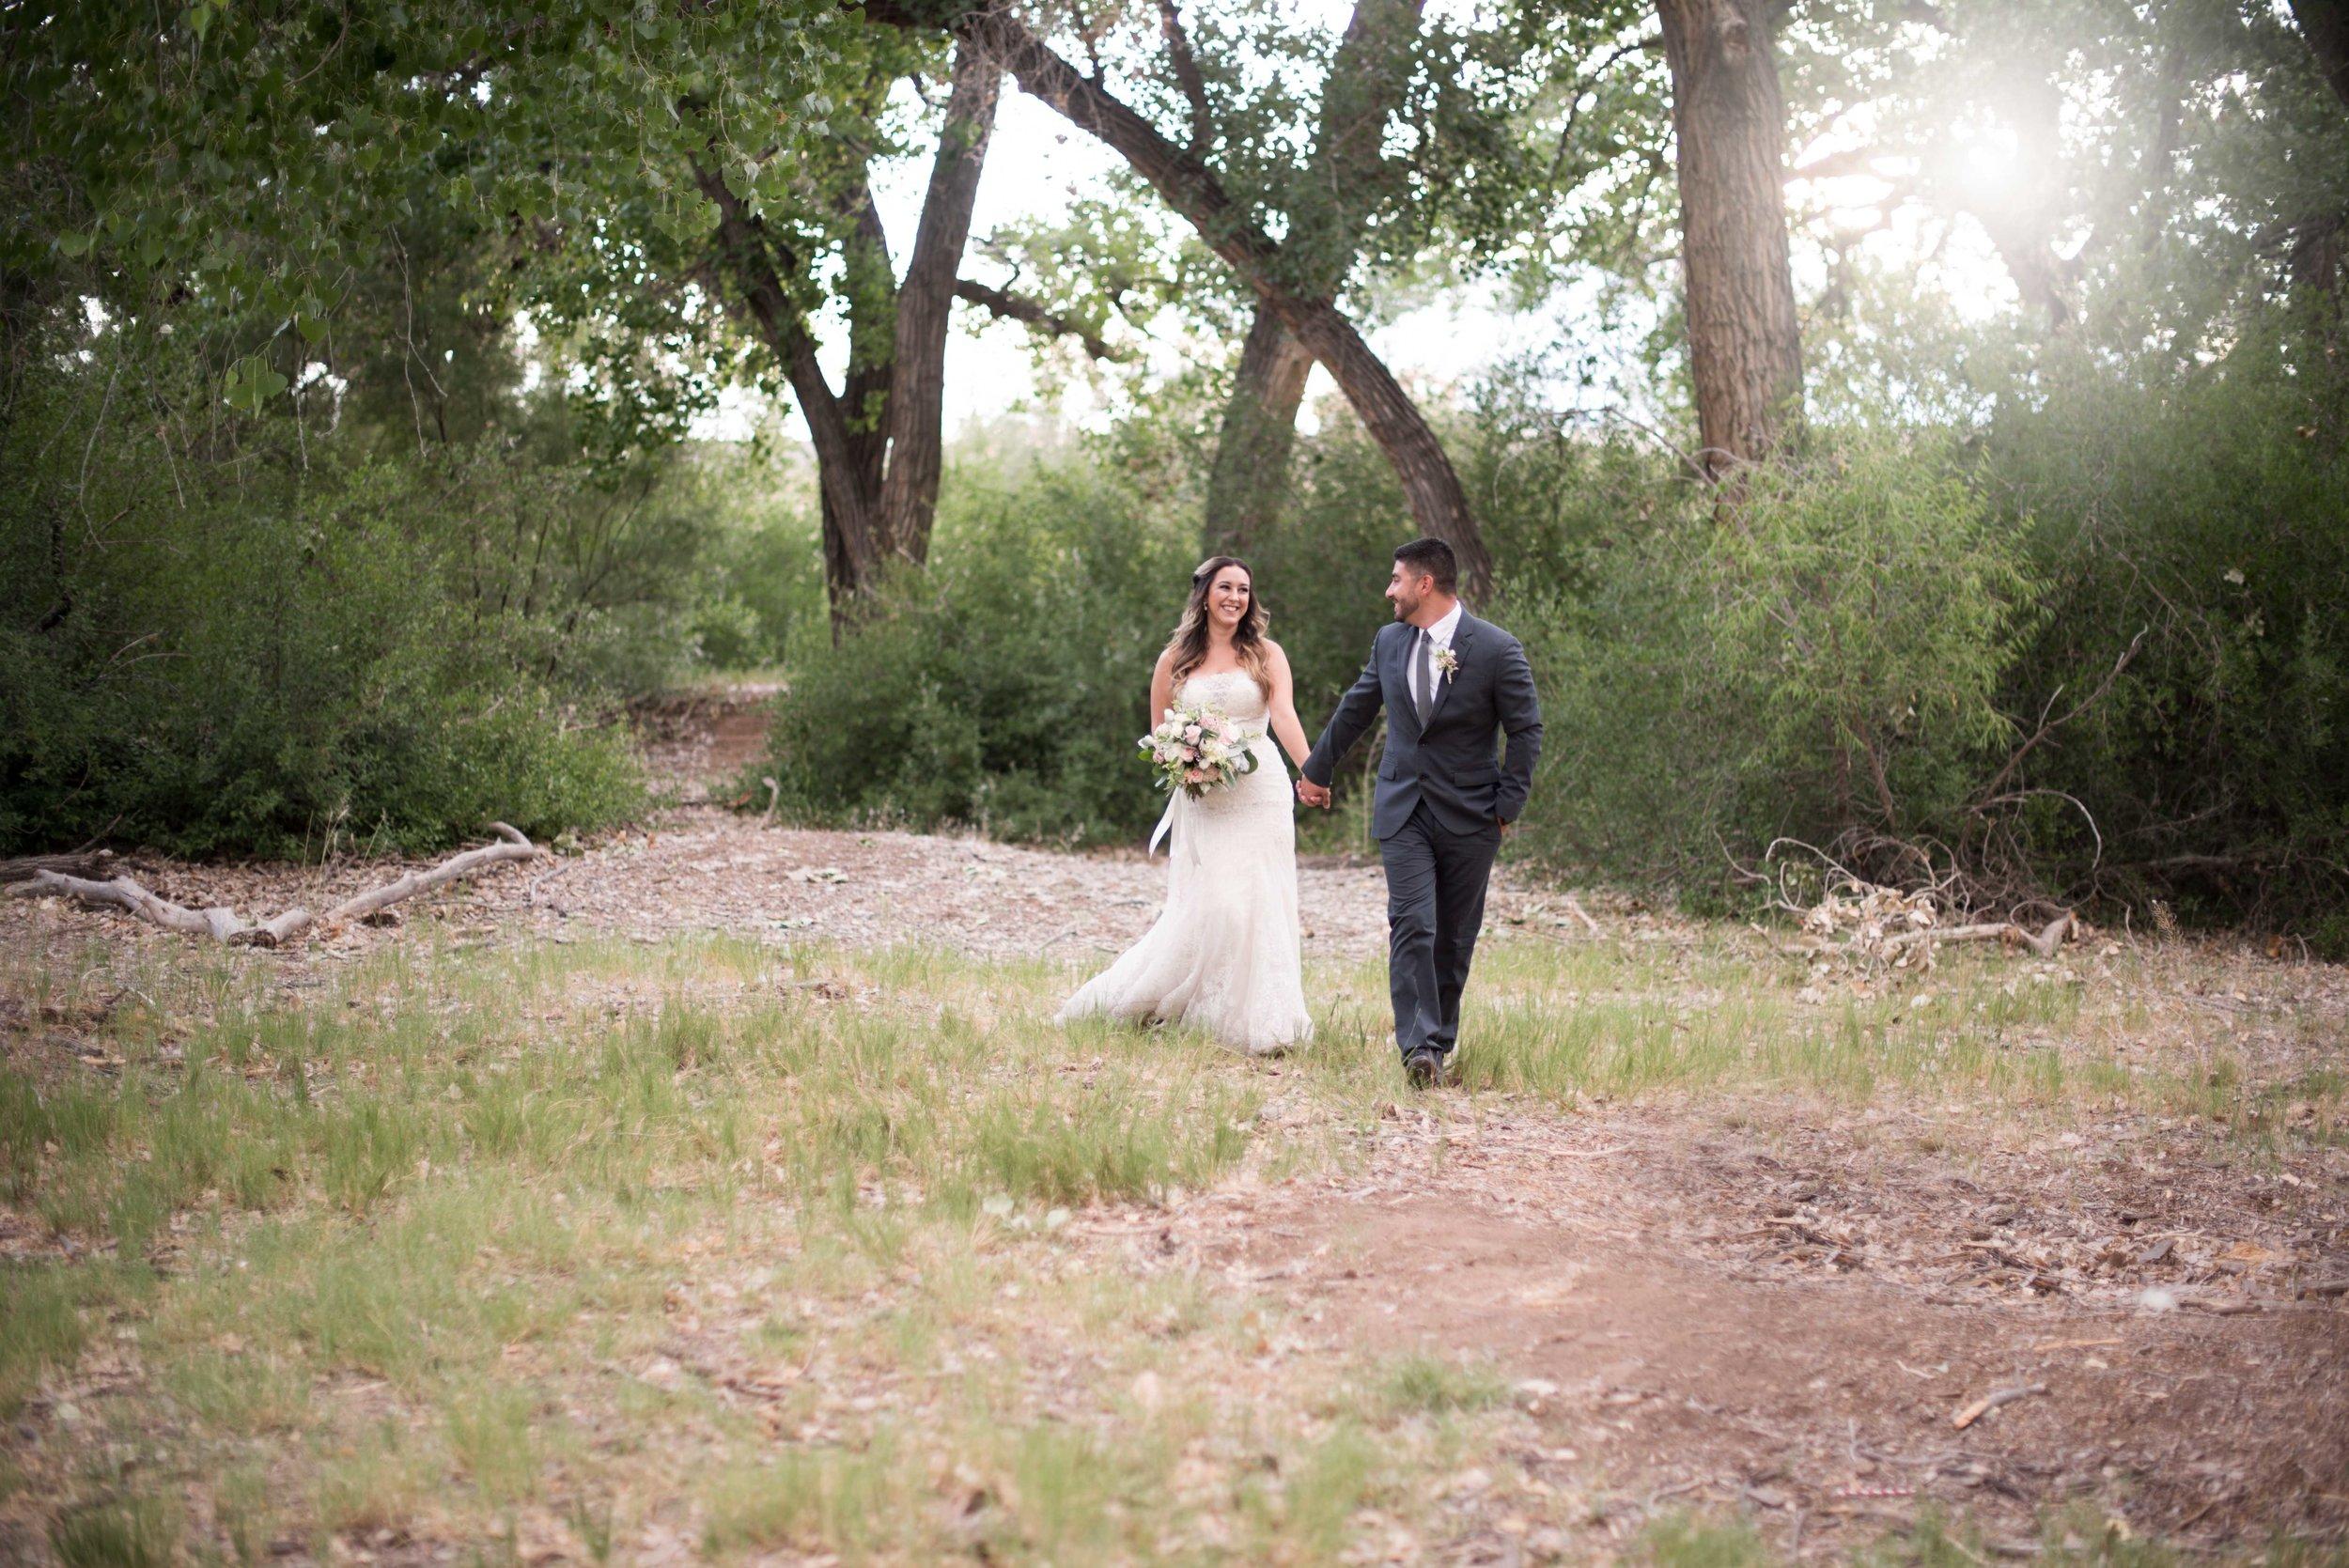 rio rancho, nm wedding photographers